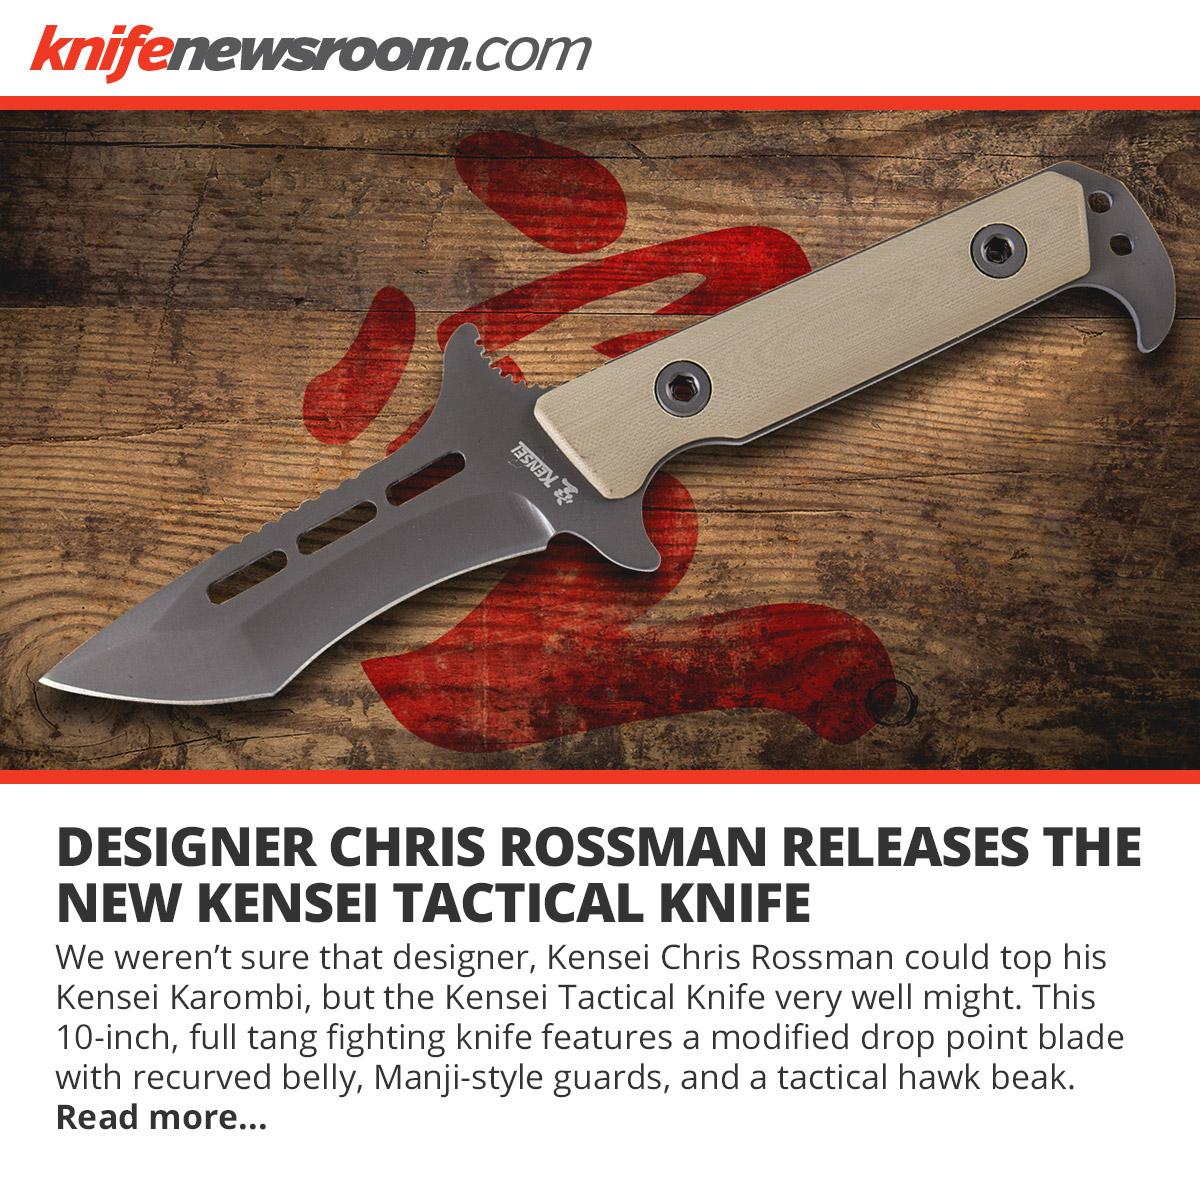 Kensei Knife